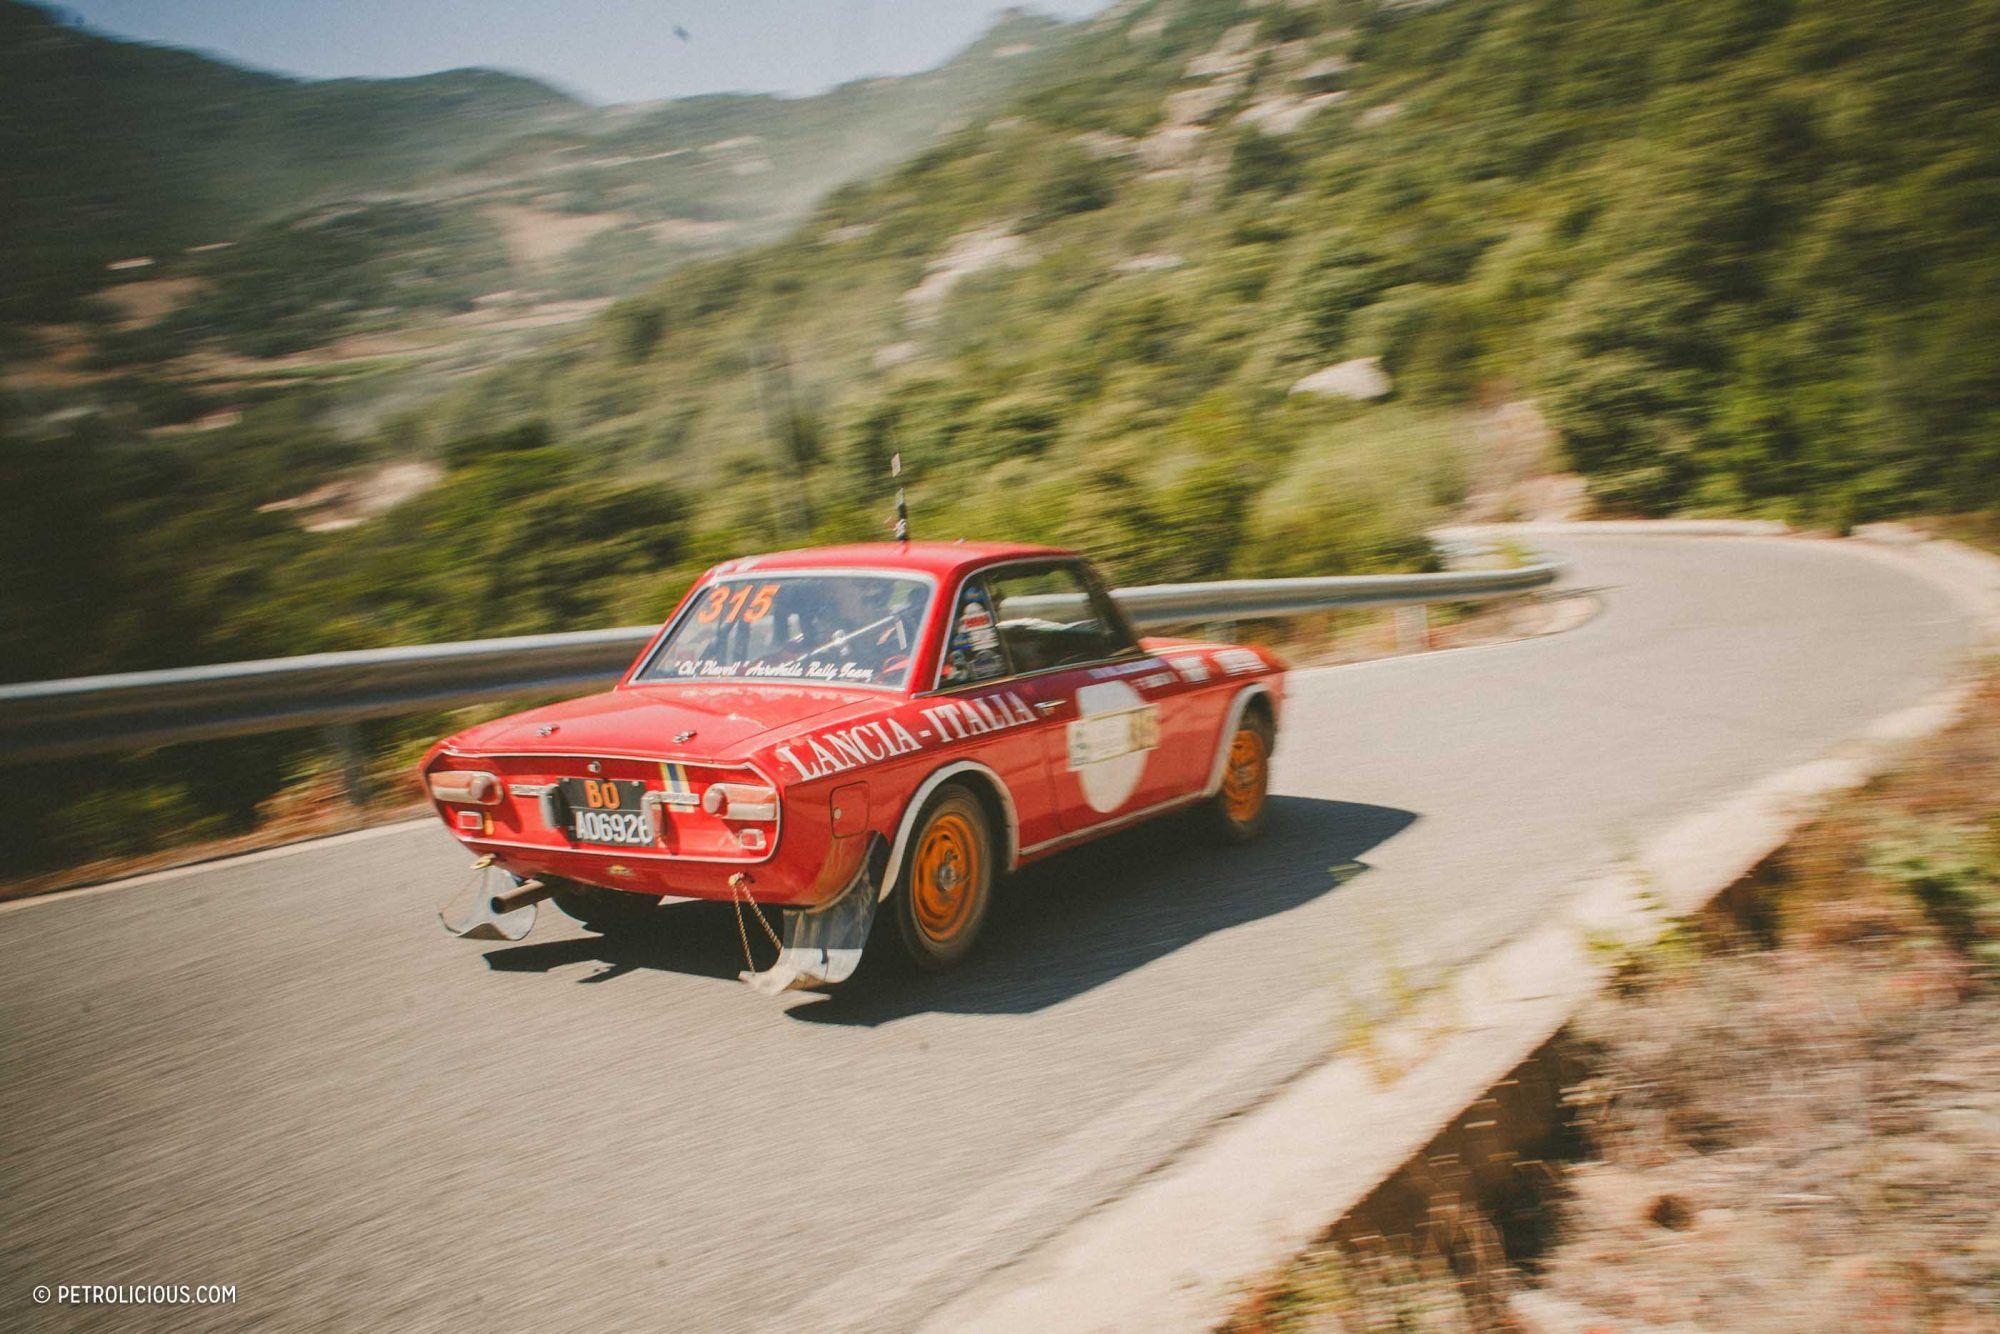 50 Photos Of Rally Beasts Conquering The Italian Coast